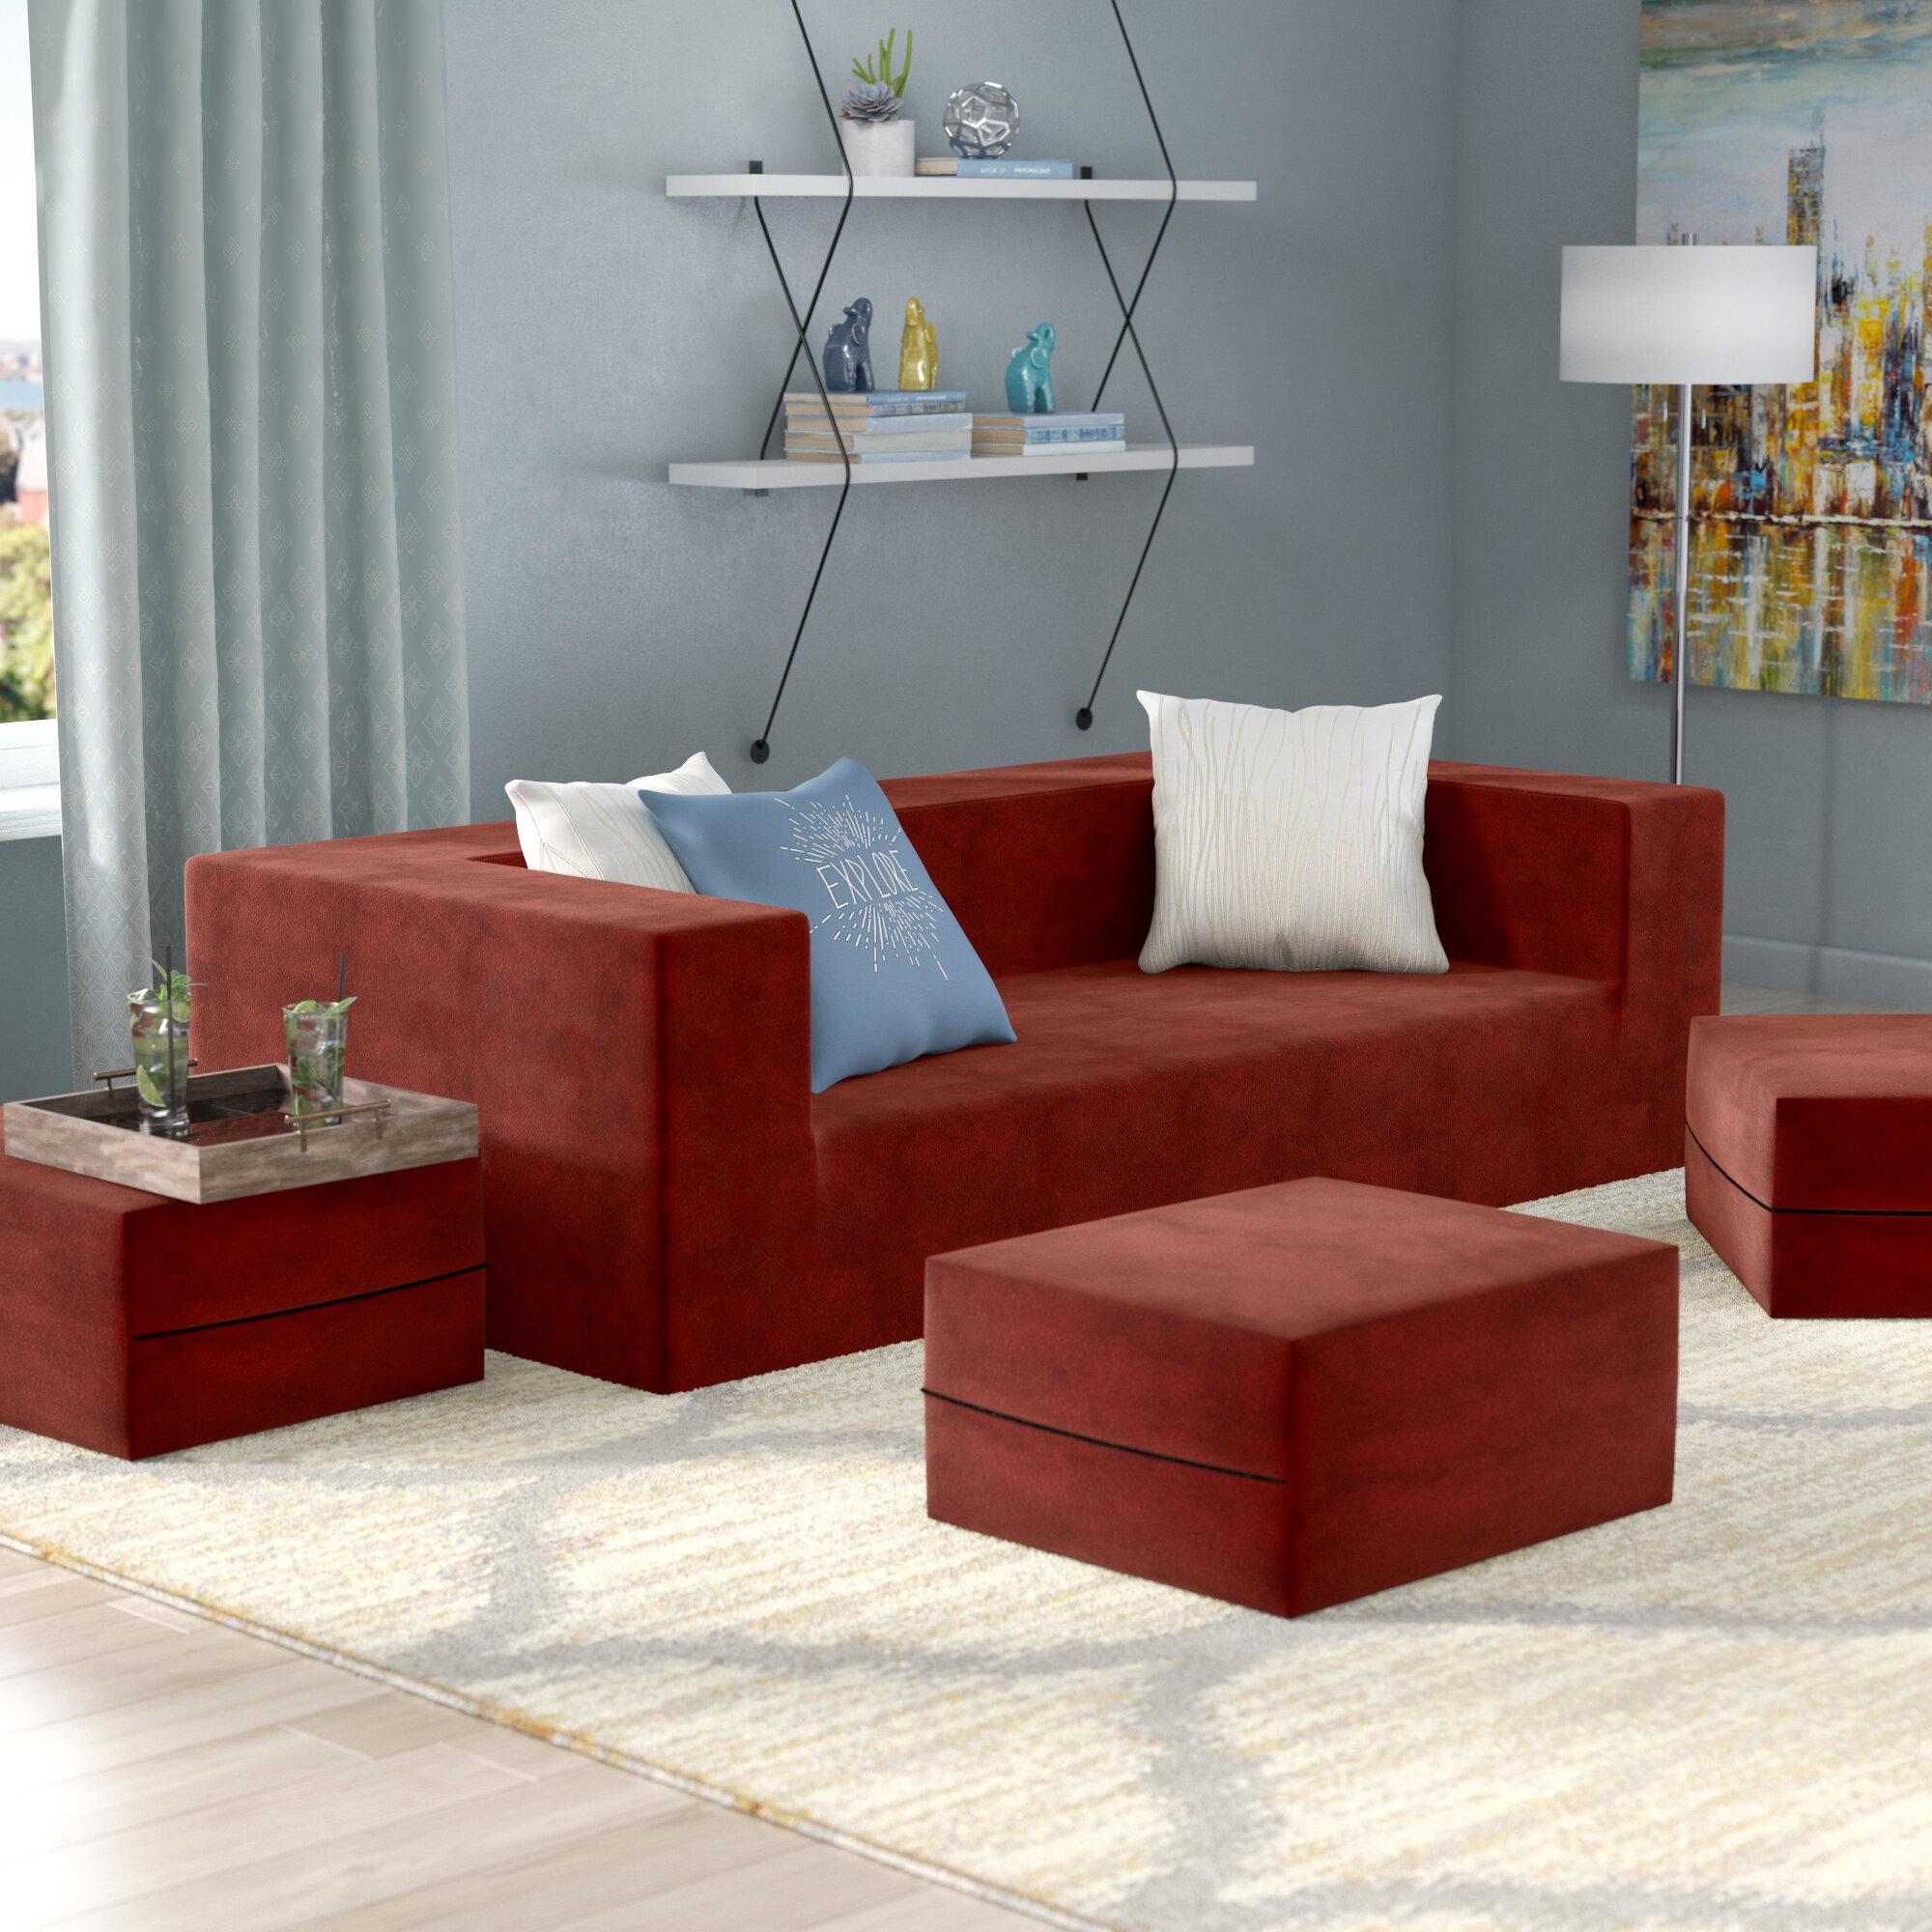 Zipcode Design Eugene Modular Sleeper Sofa With Ottomans Reviews